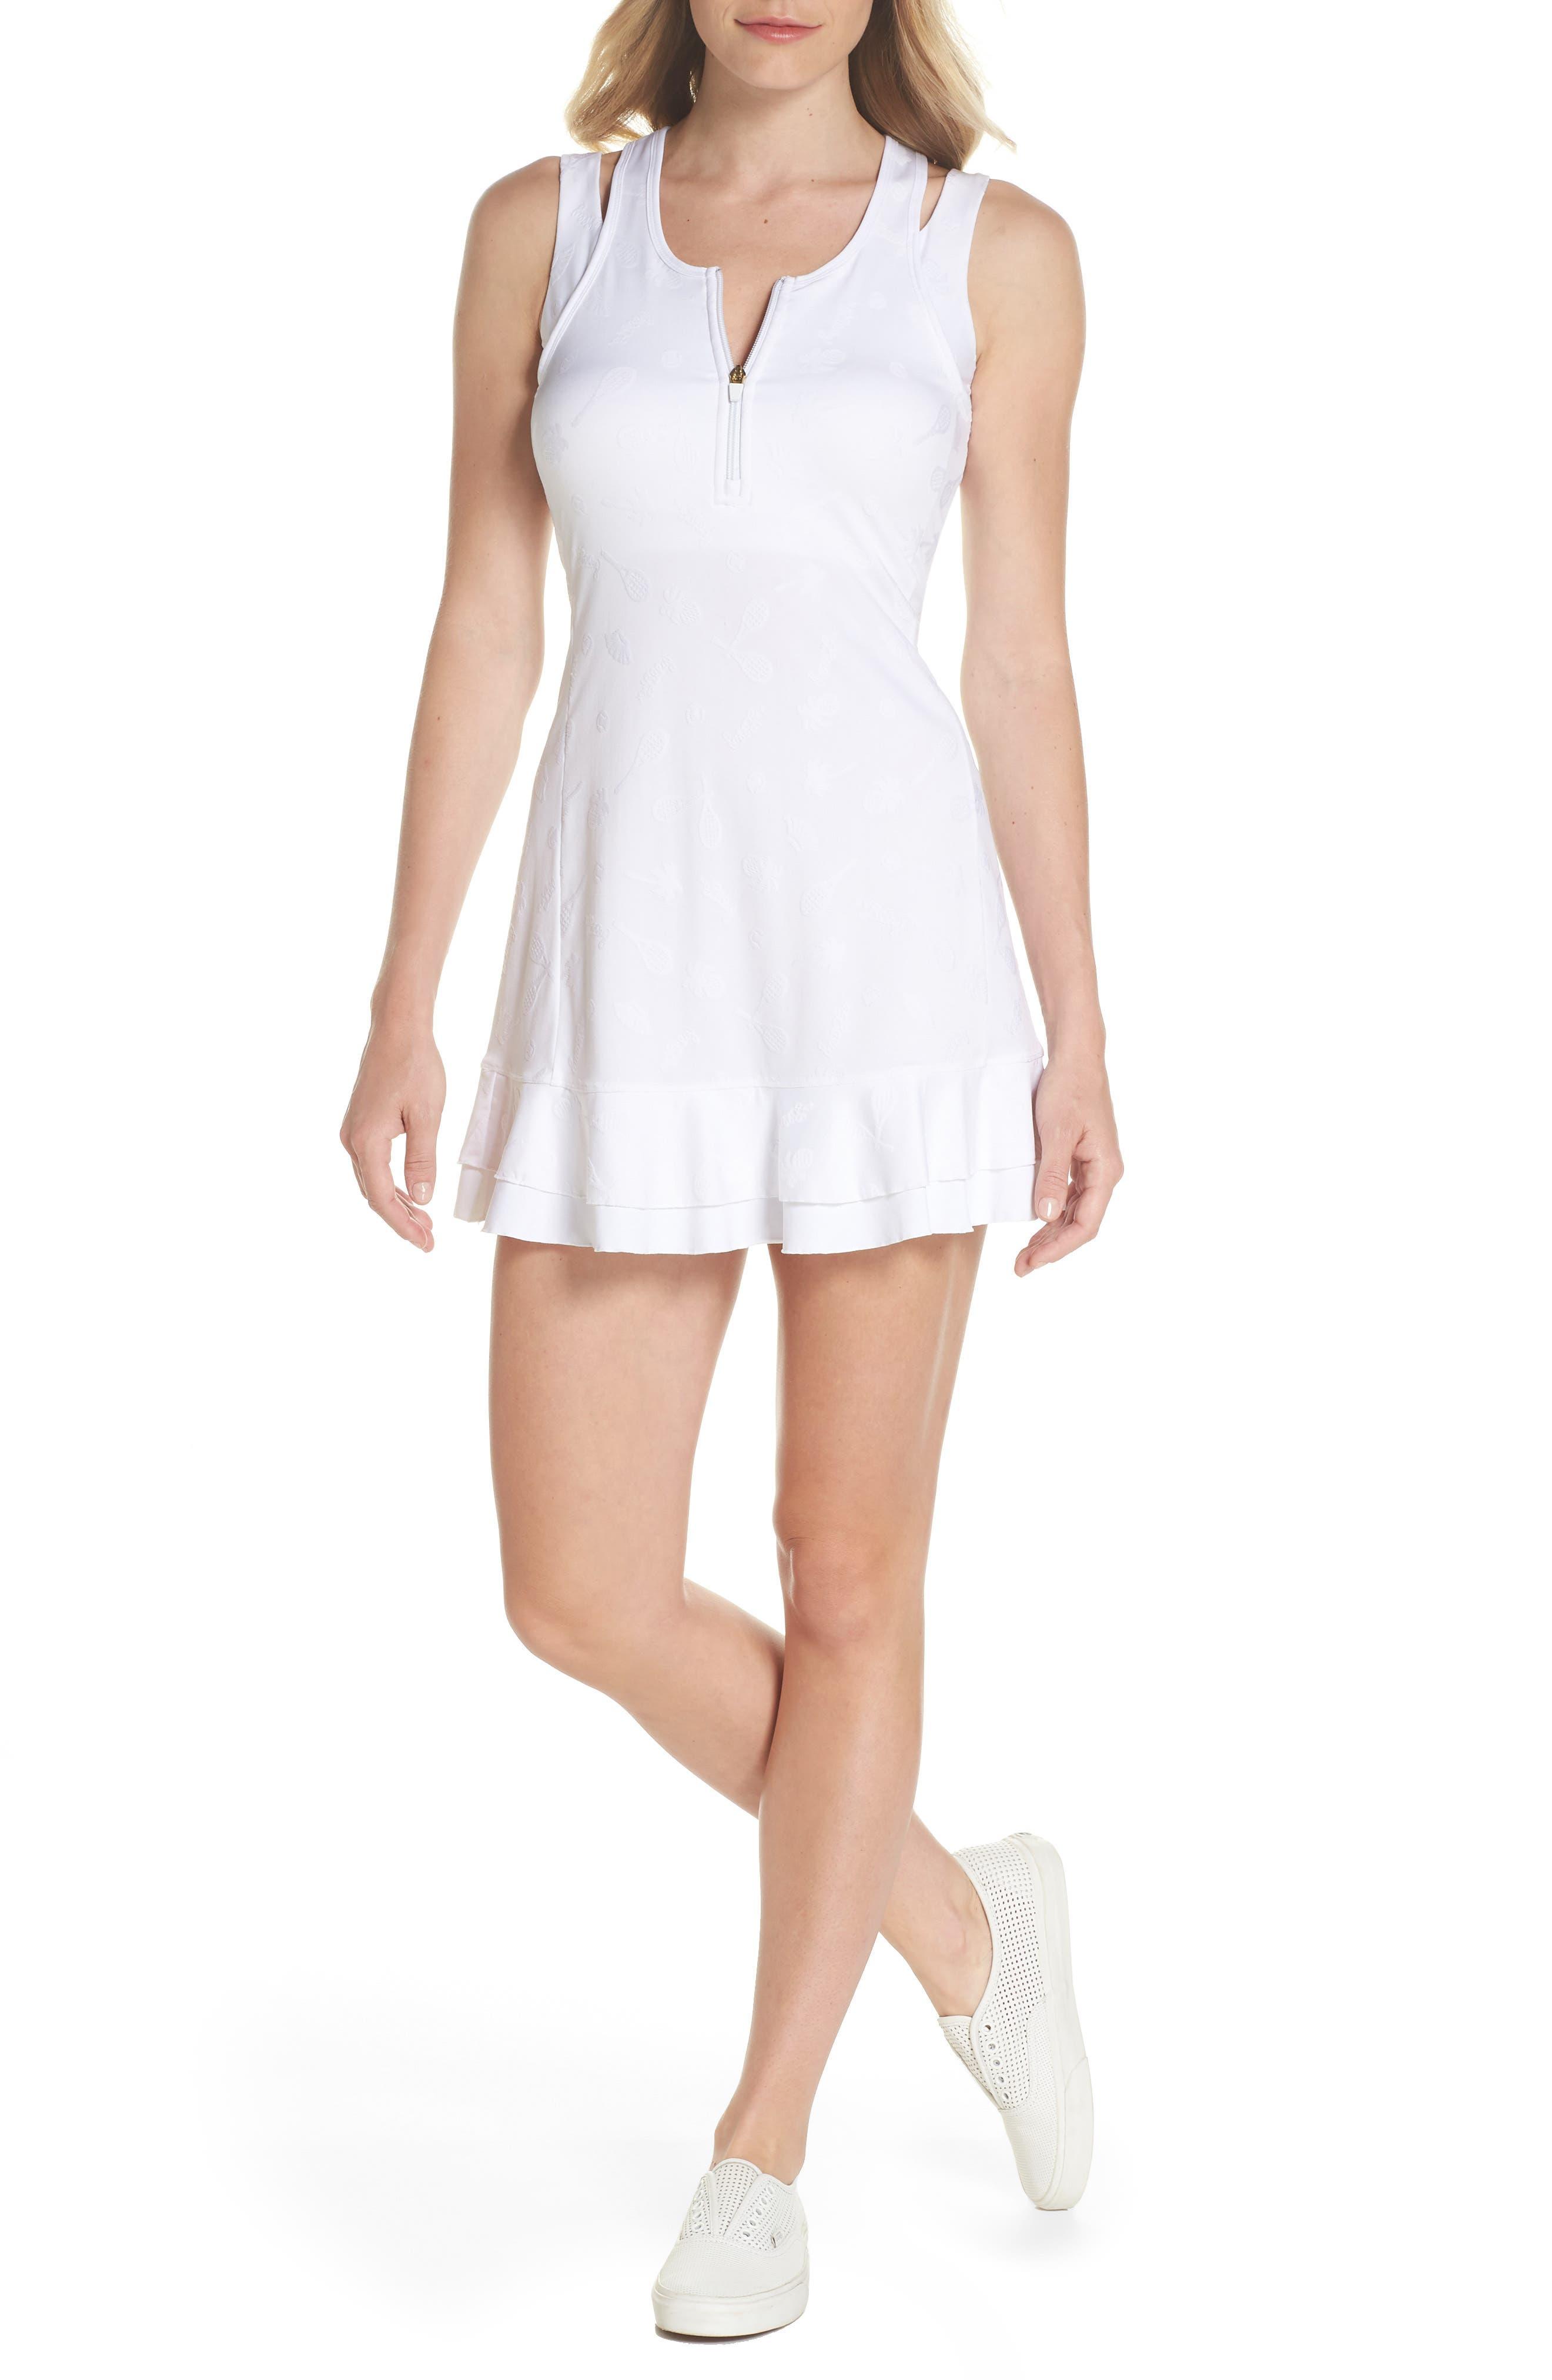 Delphina UPF 50+ Tennis Dress,                             Main thumbnail 1, color,                             Resort White Perfect Match Jaq